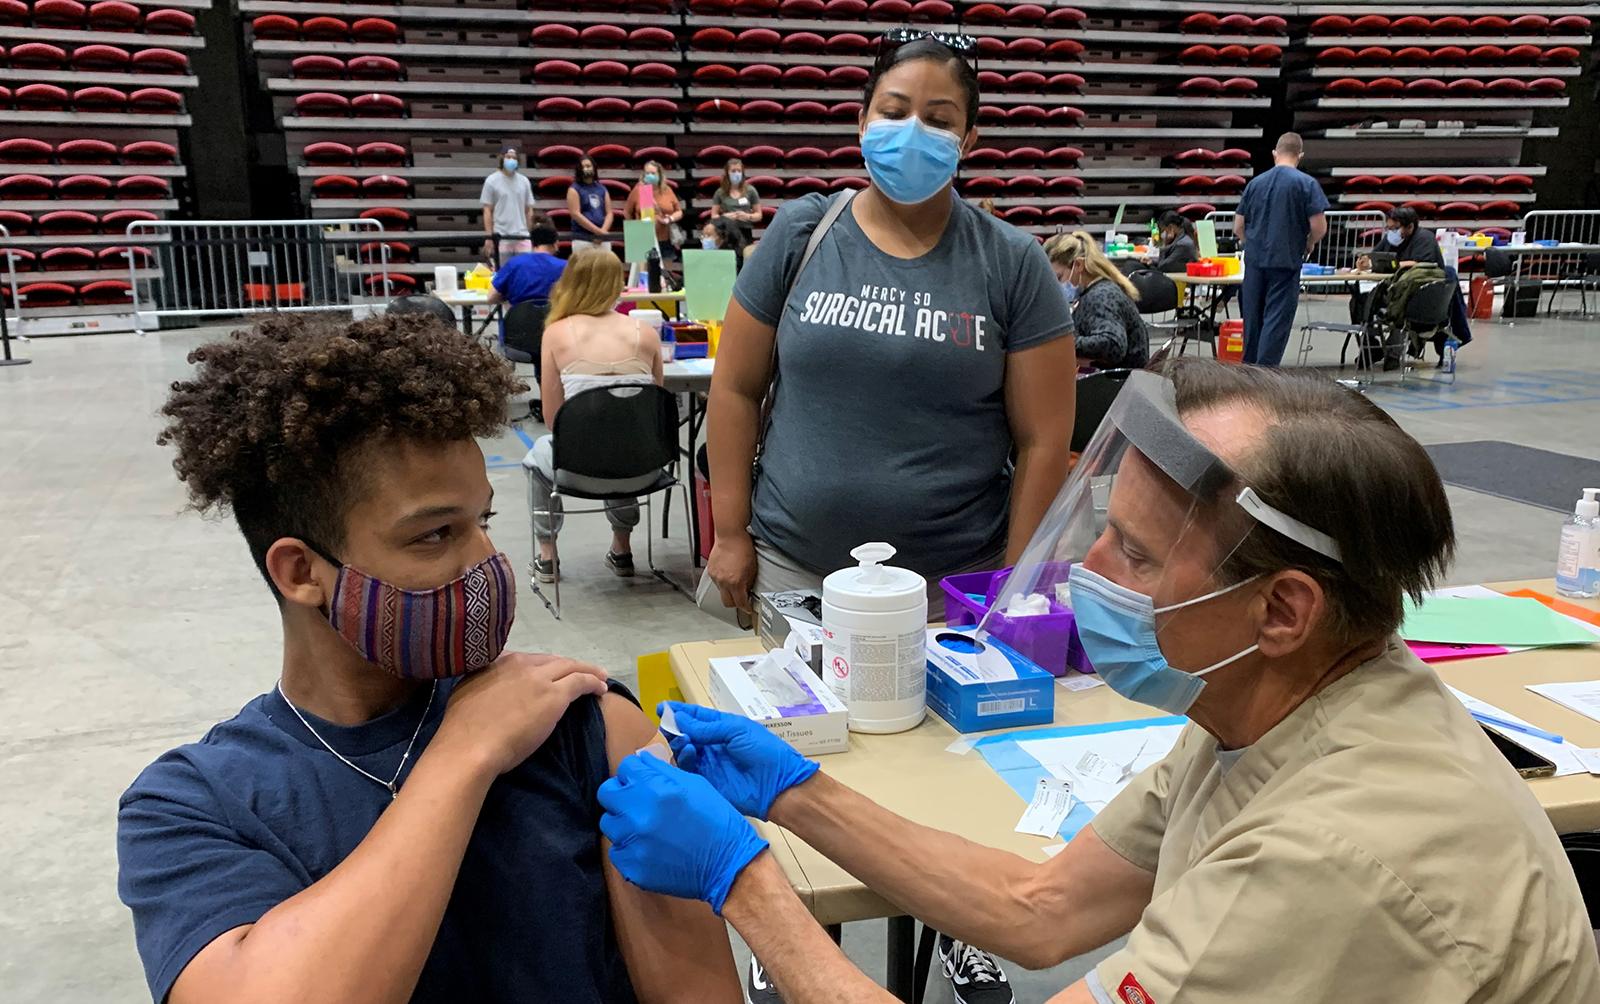 Teenage boy gets his COVID-19 vaccination.